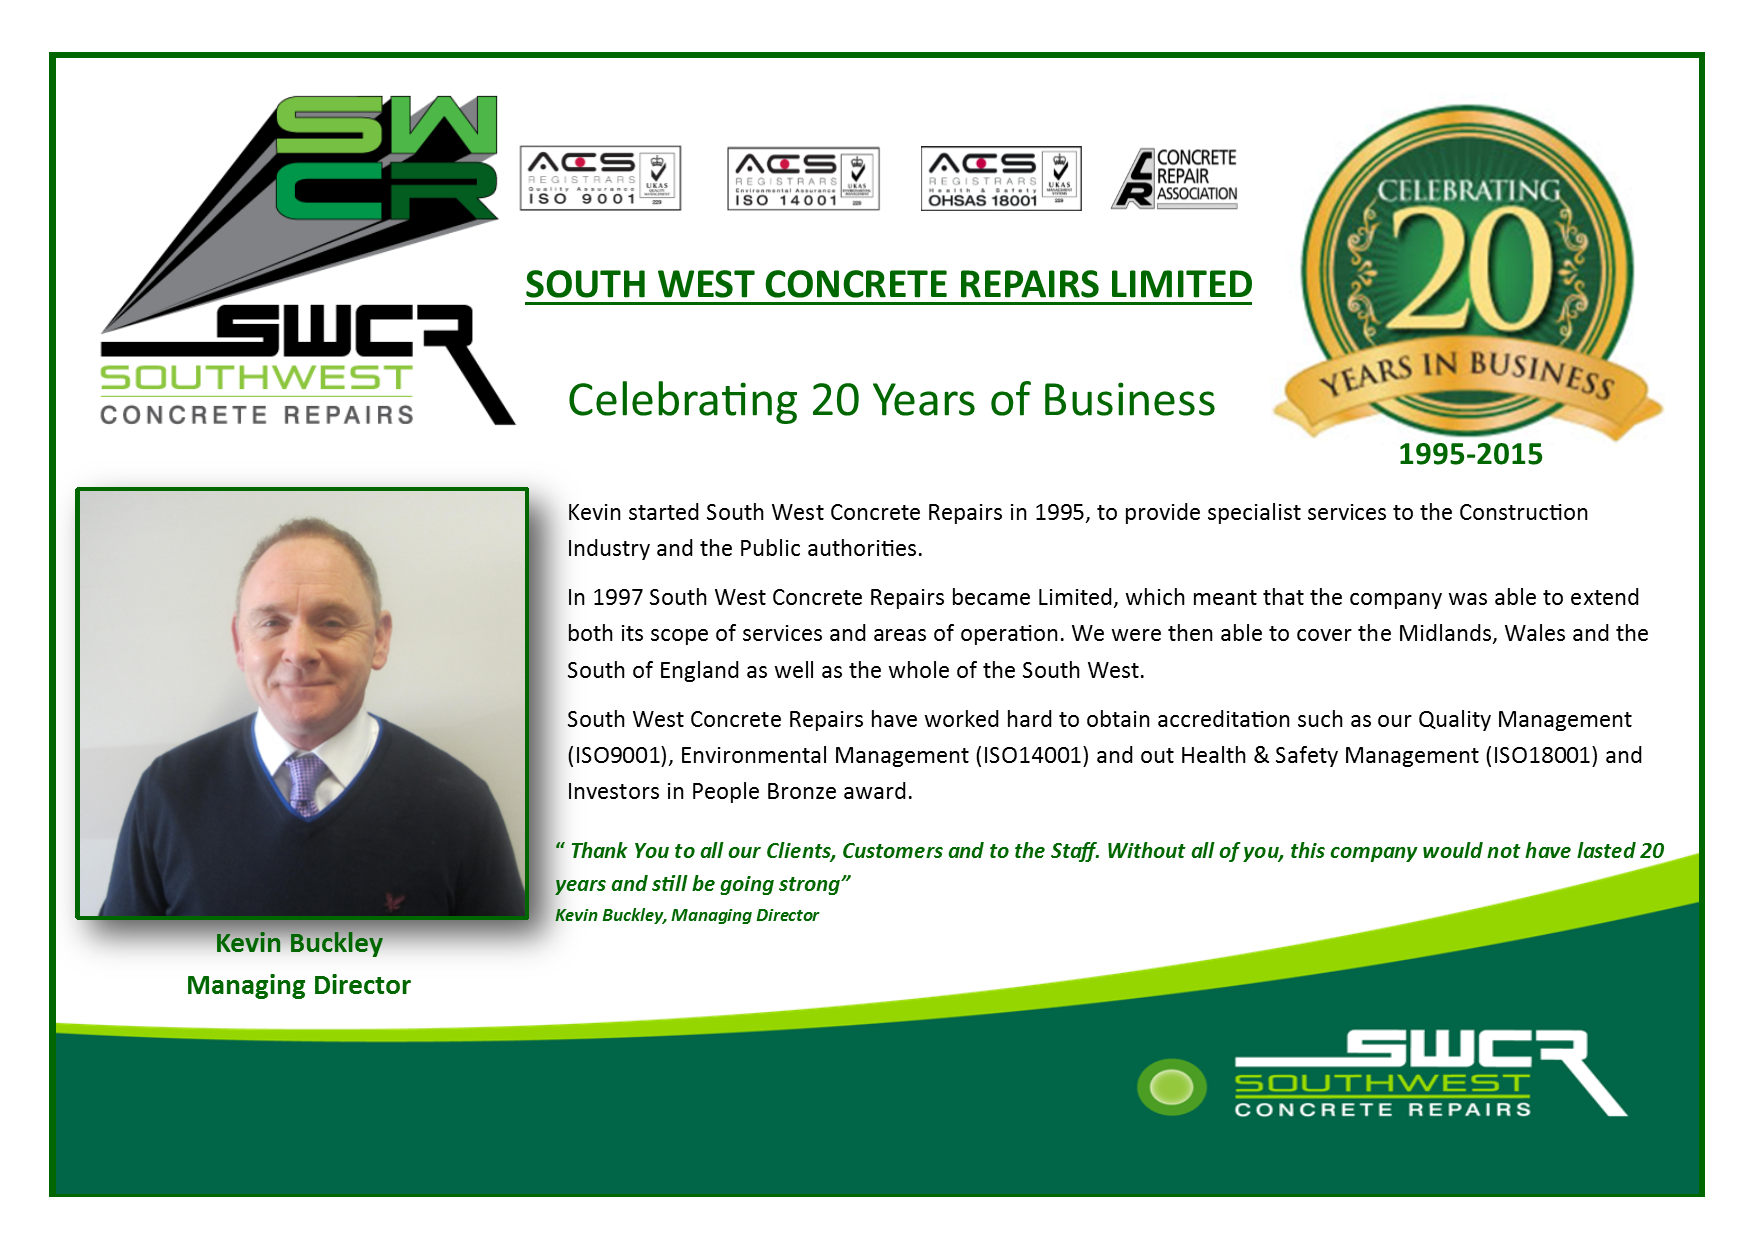 SWCR business celebration